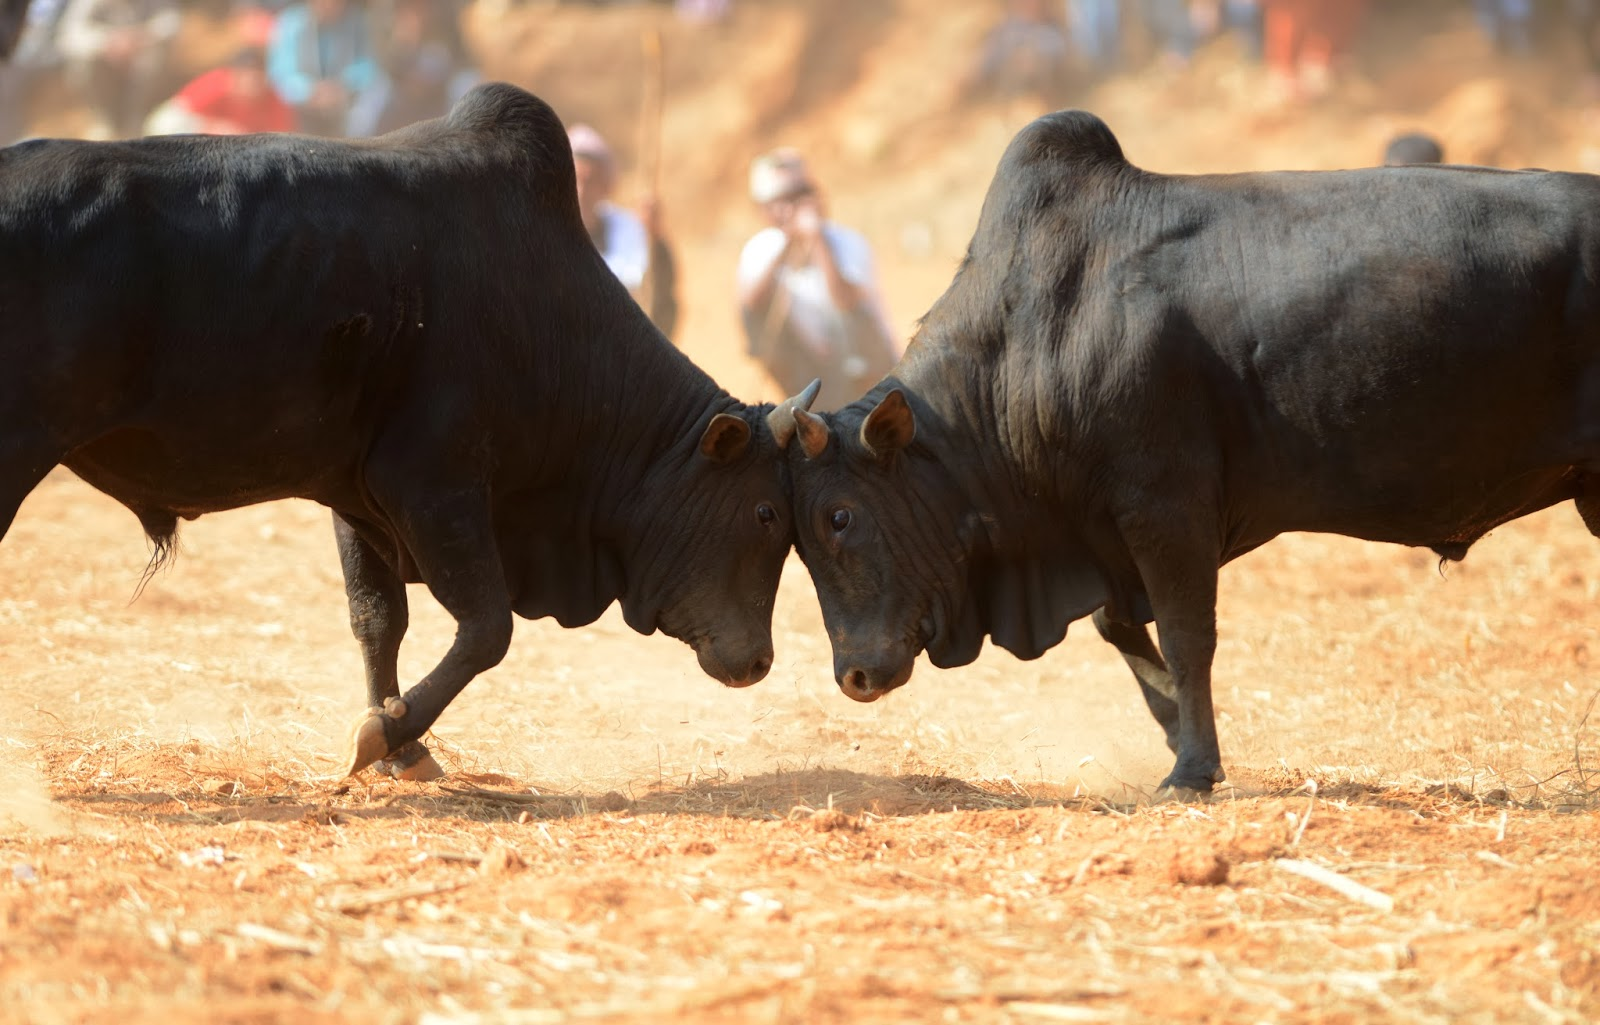 Kathmandu, Bullfighting, Bull, Nepal, Nuwakot, Taraka, Village, Festival, Maghesangranti, Buffalo, Spectators, Opponent, Offbeat, Lifestyle, Culture,